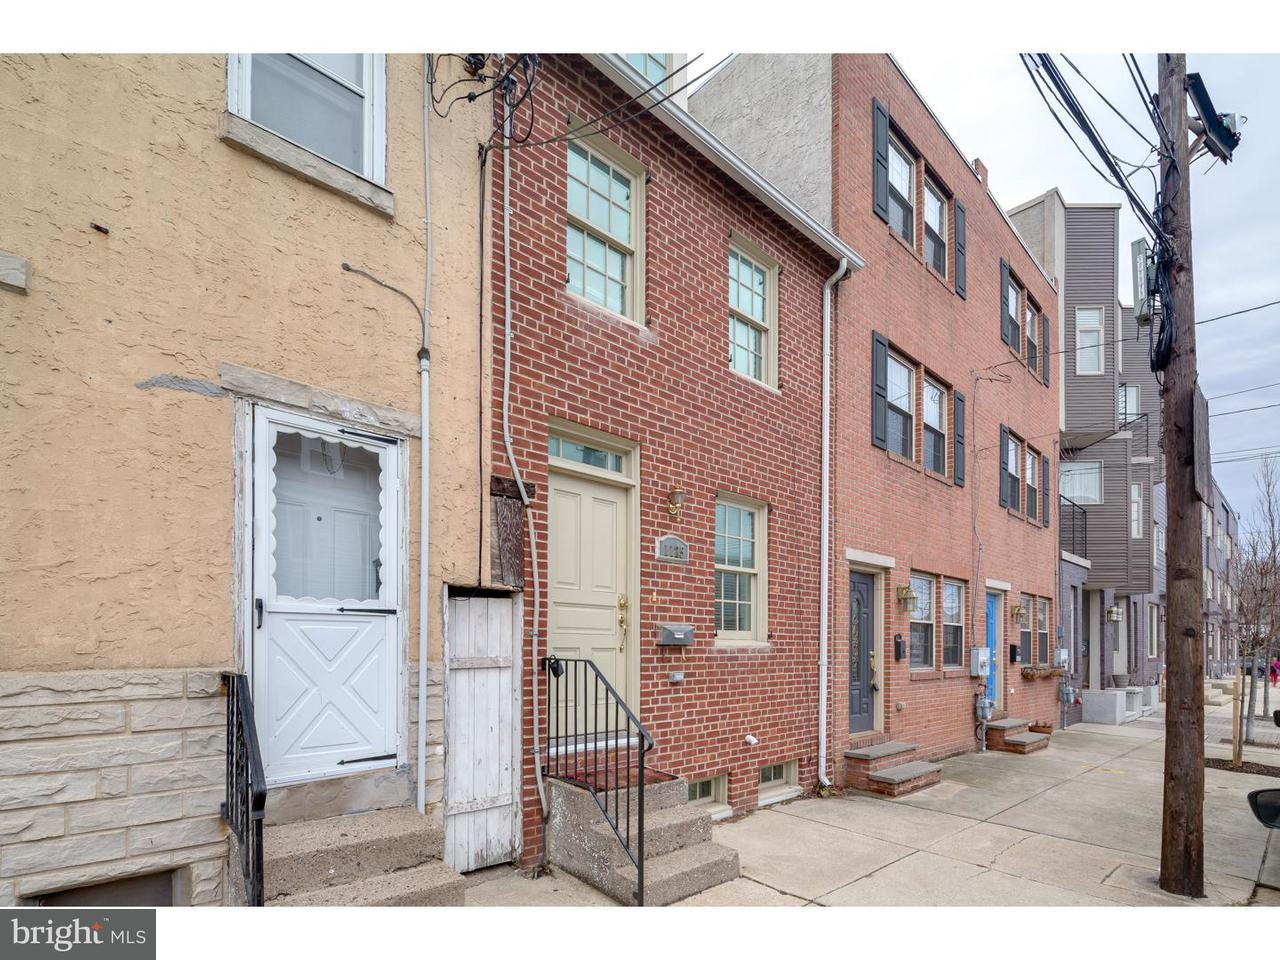 1125 E Berks Philadelphia, PA 19125